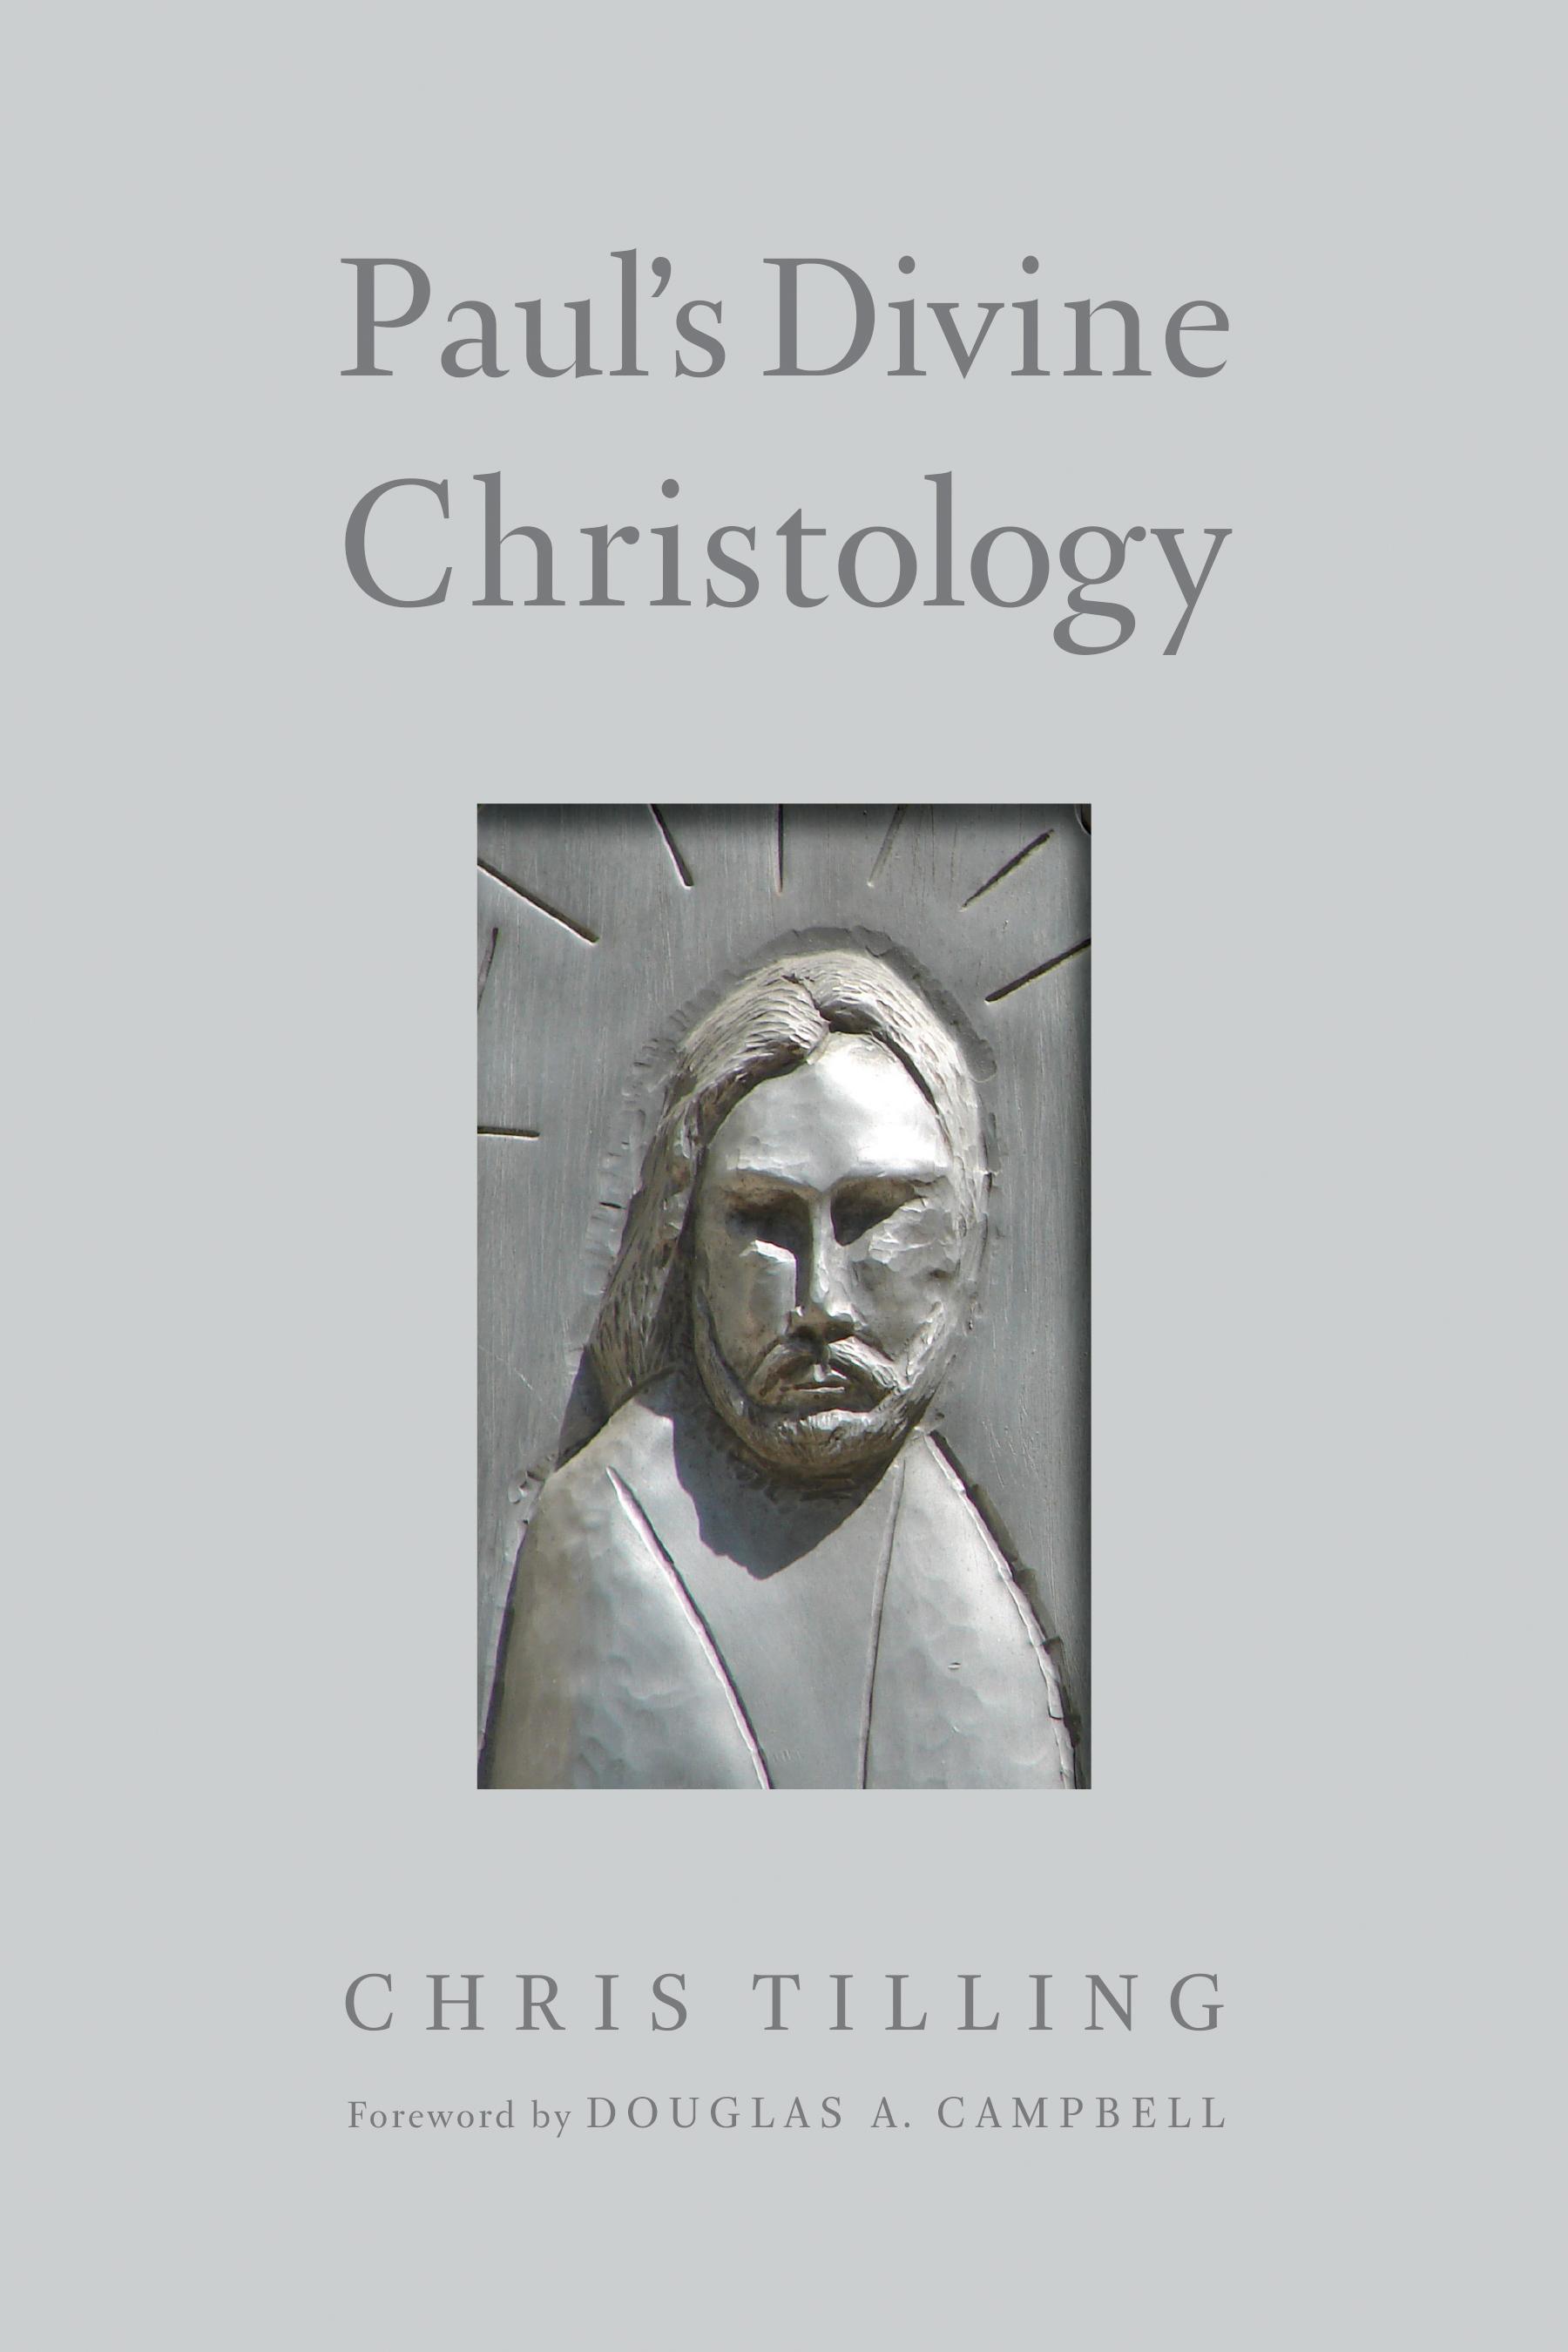 Paul's Divine Christology